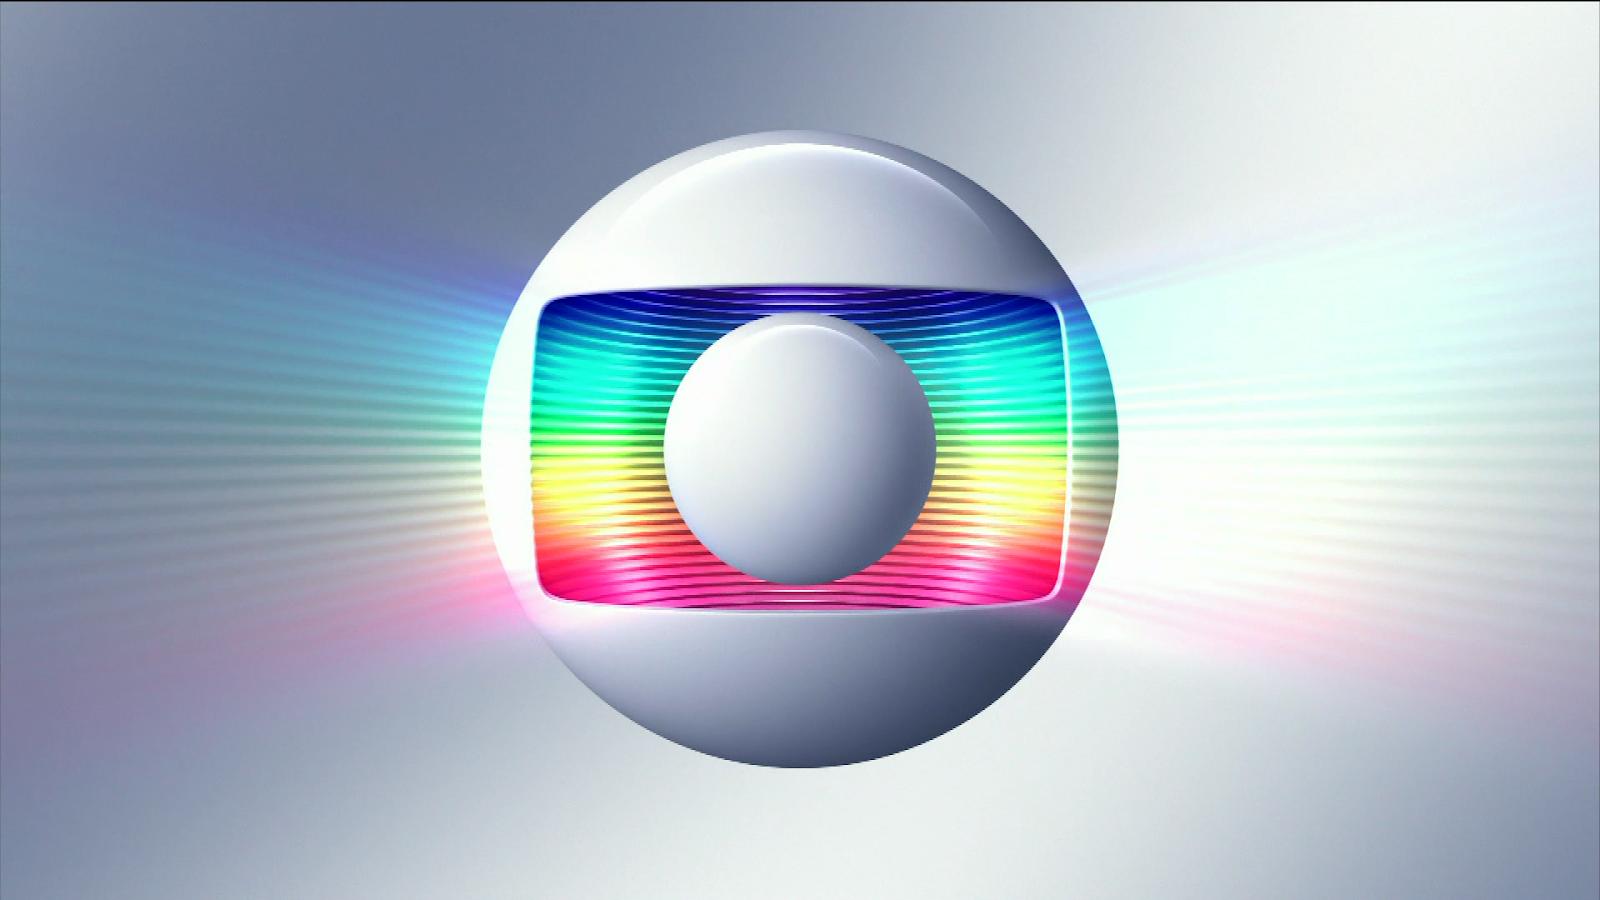 Assistir Globo HD - Ao Vivo Online na Internet hd